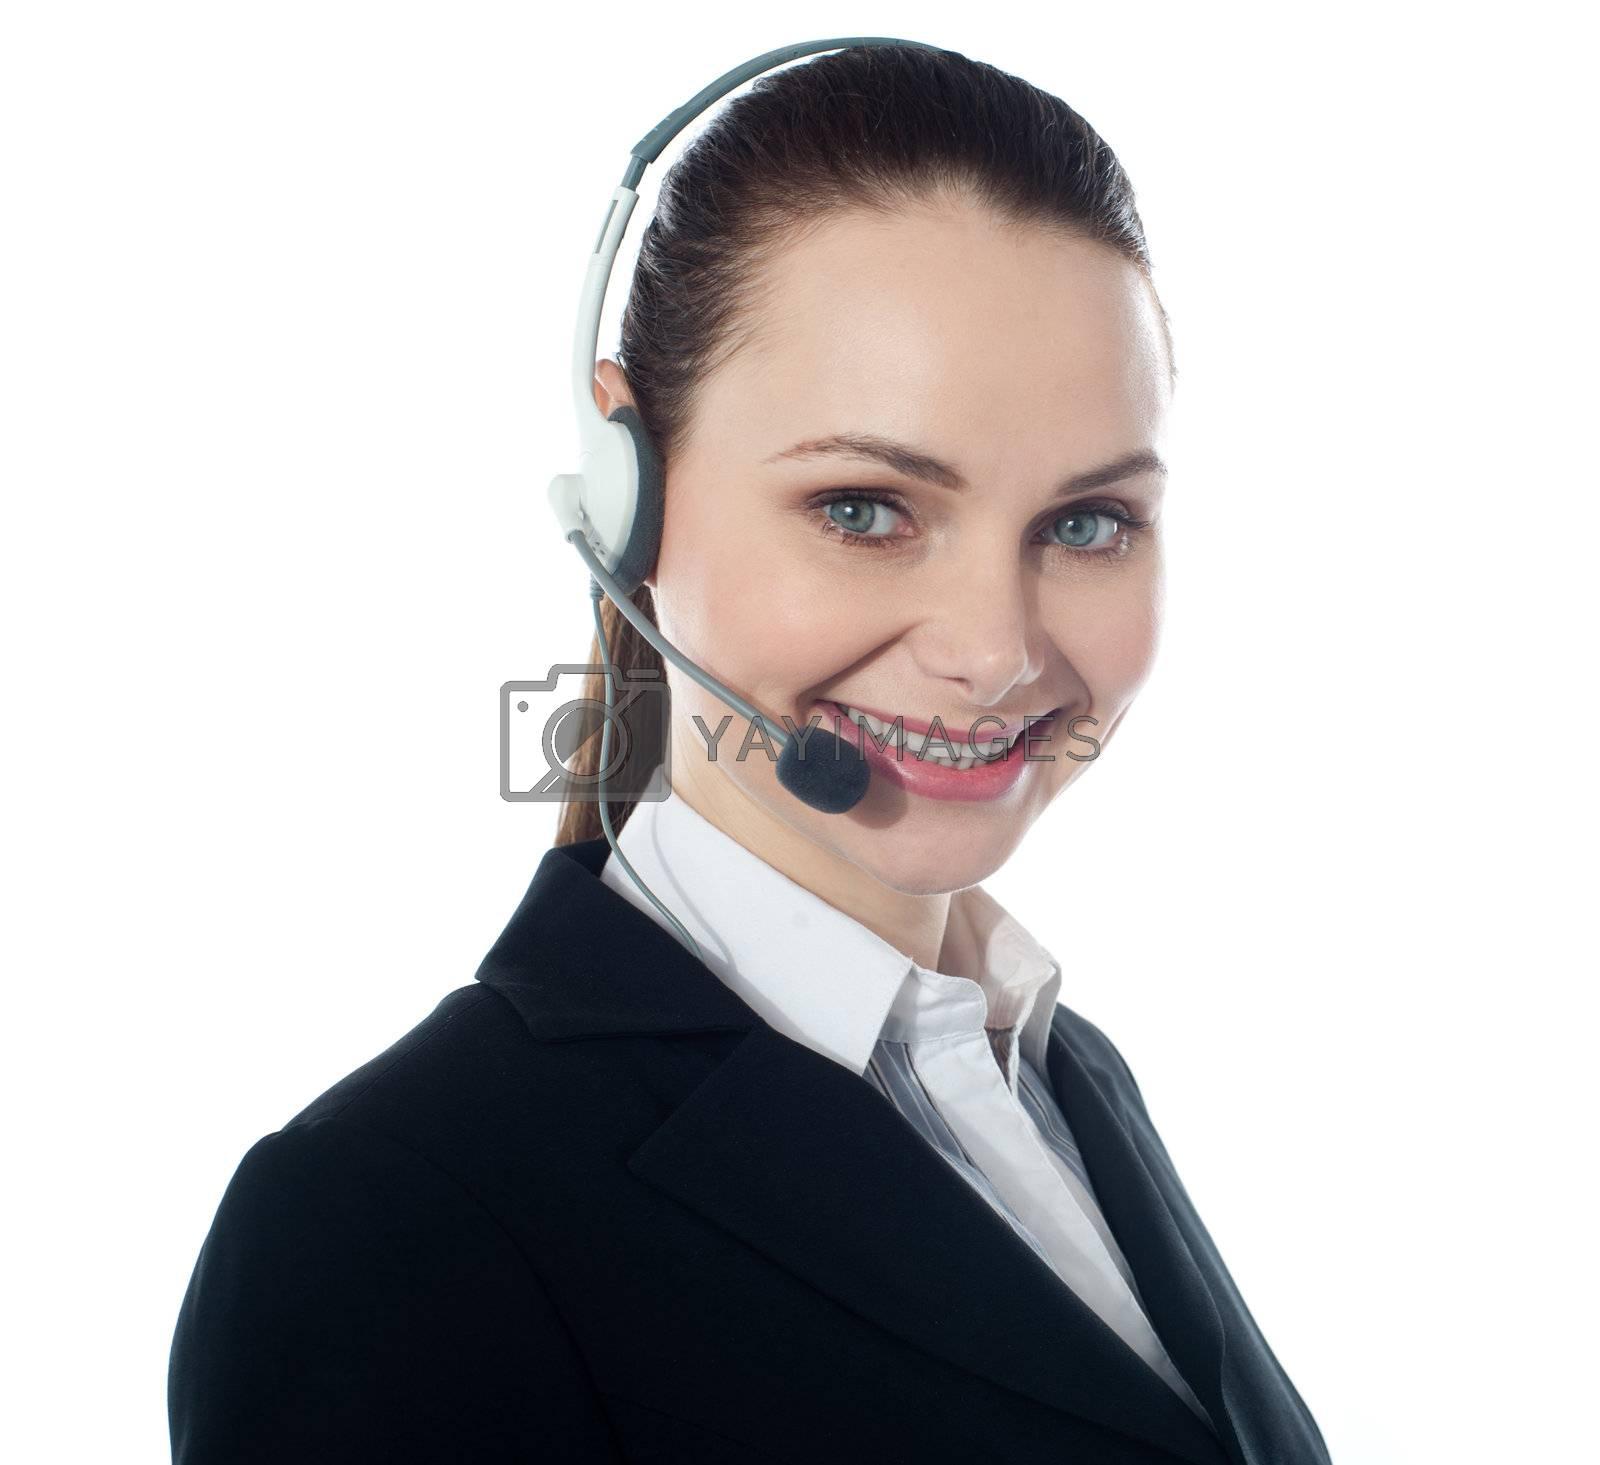 Call centre female executive, closeup. Isolated over white